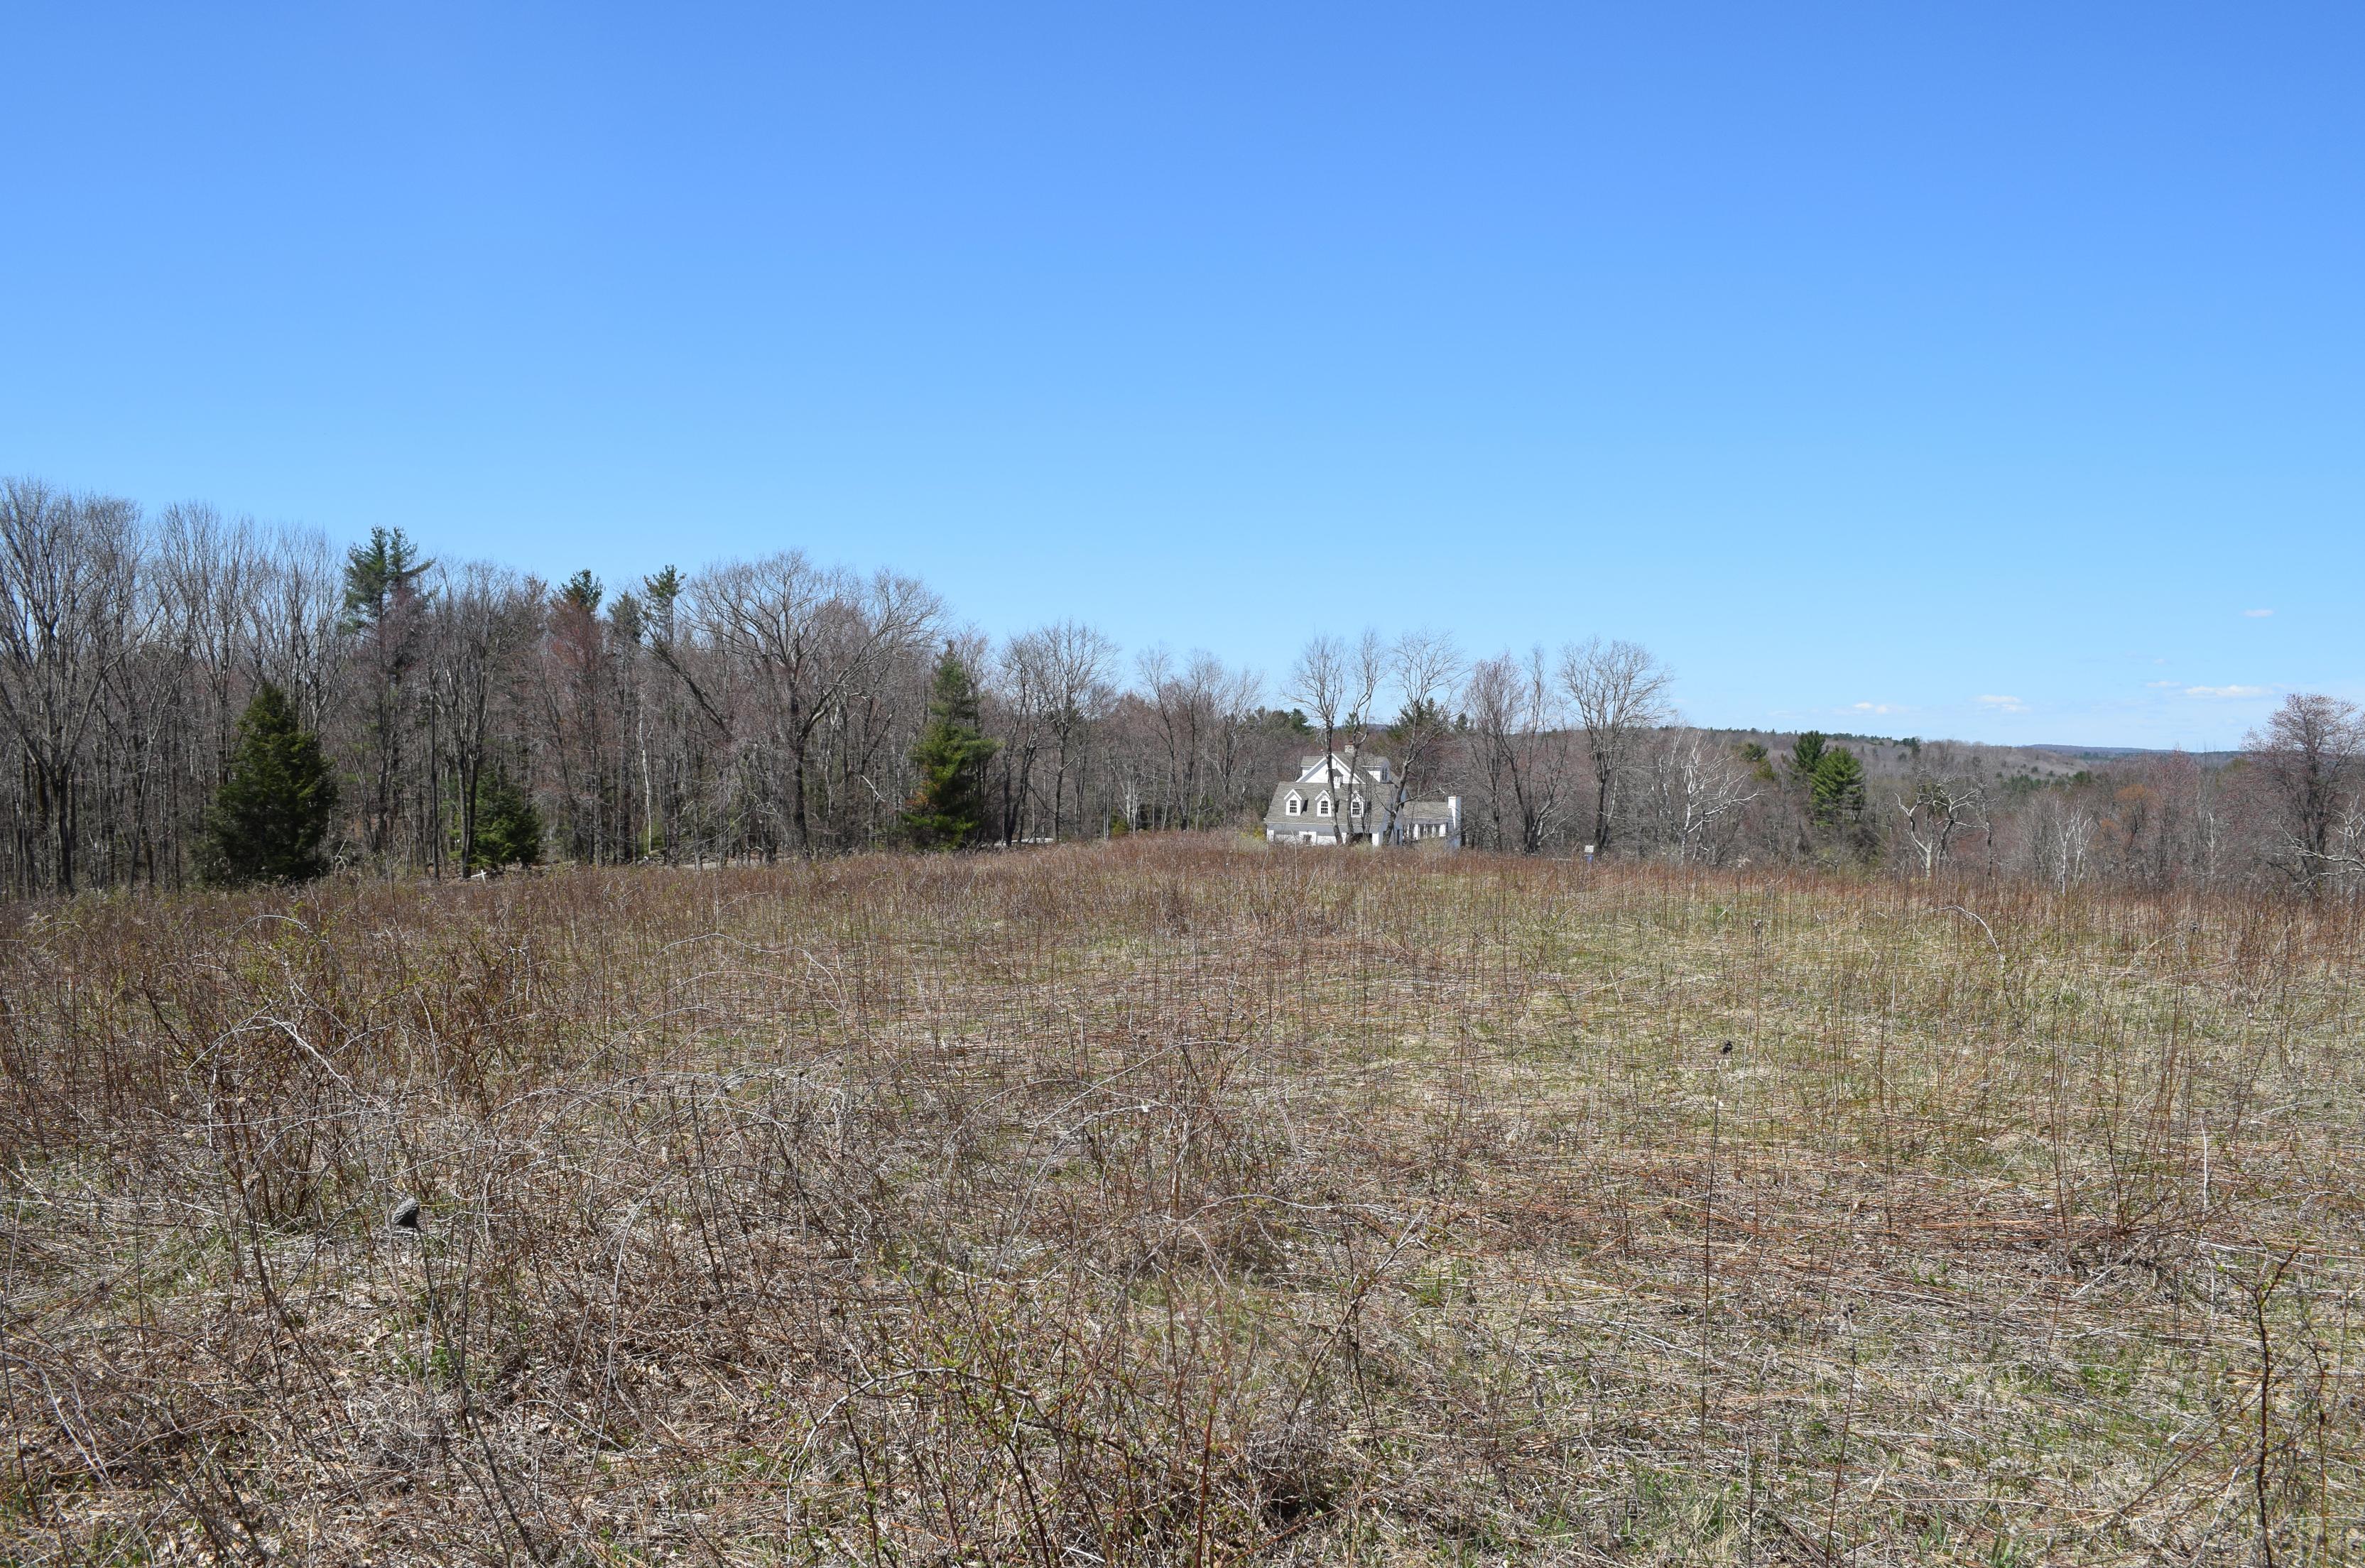 Terreno por un Venta en Outstanding Litchfield Location with Long Views Maple View Trail Litchfield, Connecticut 06759 Estados Unidos